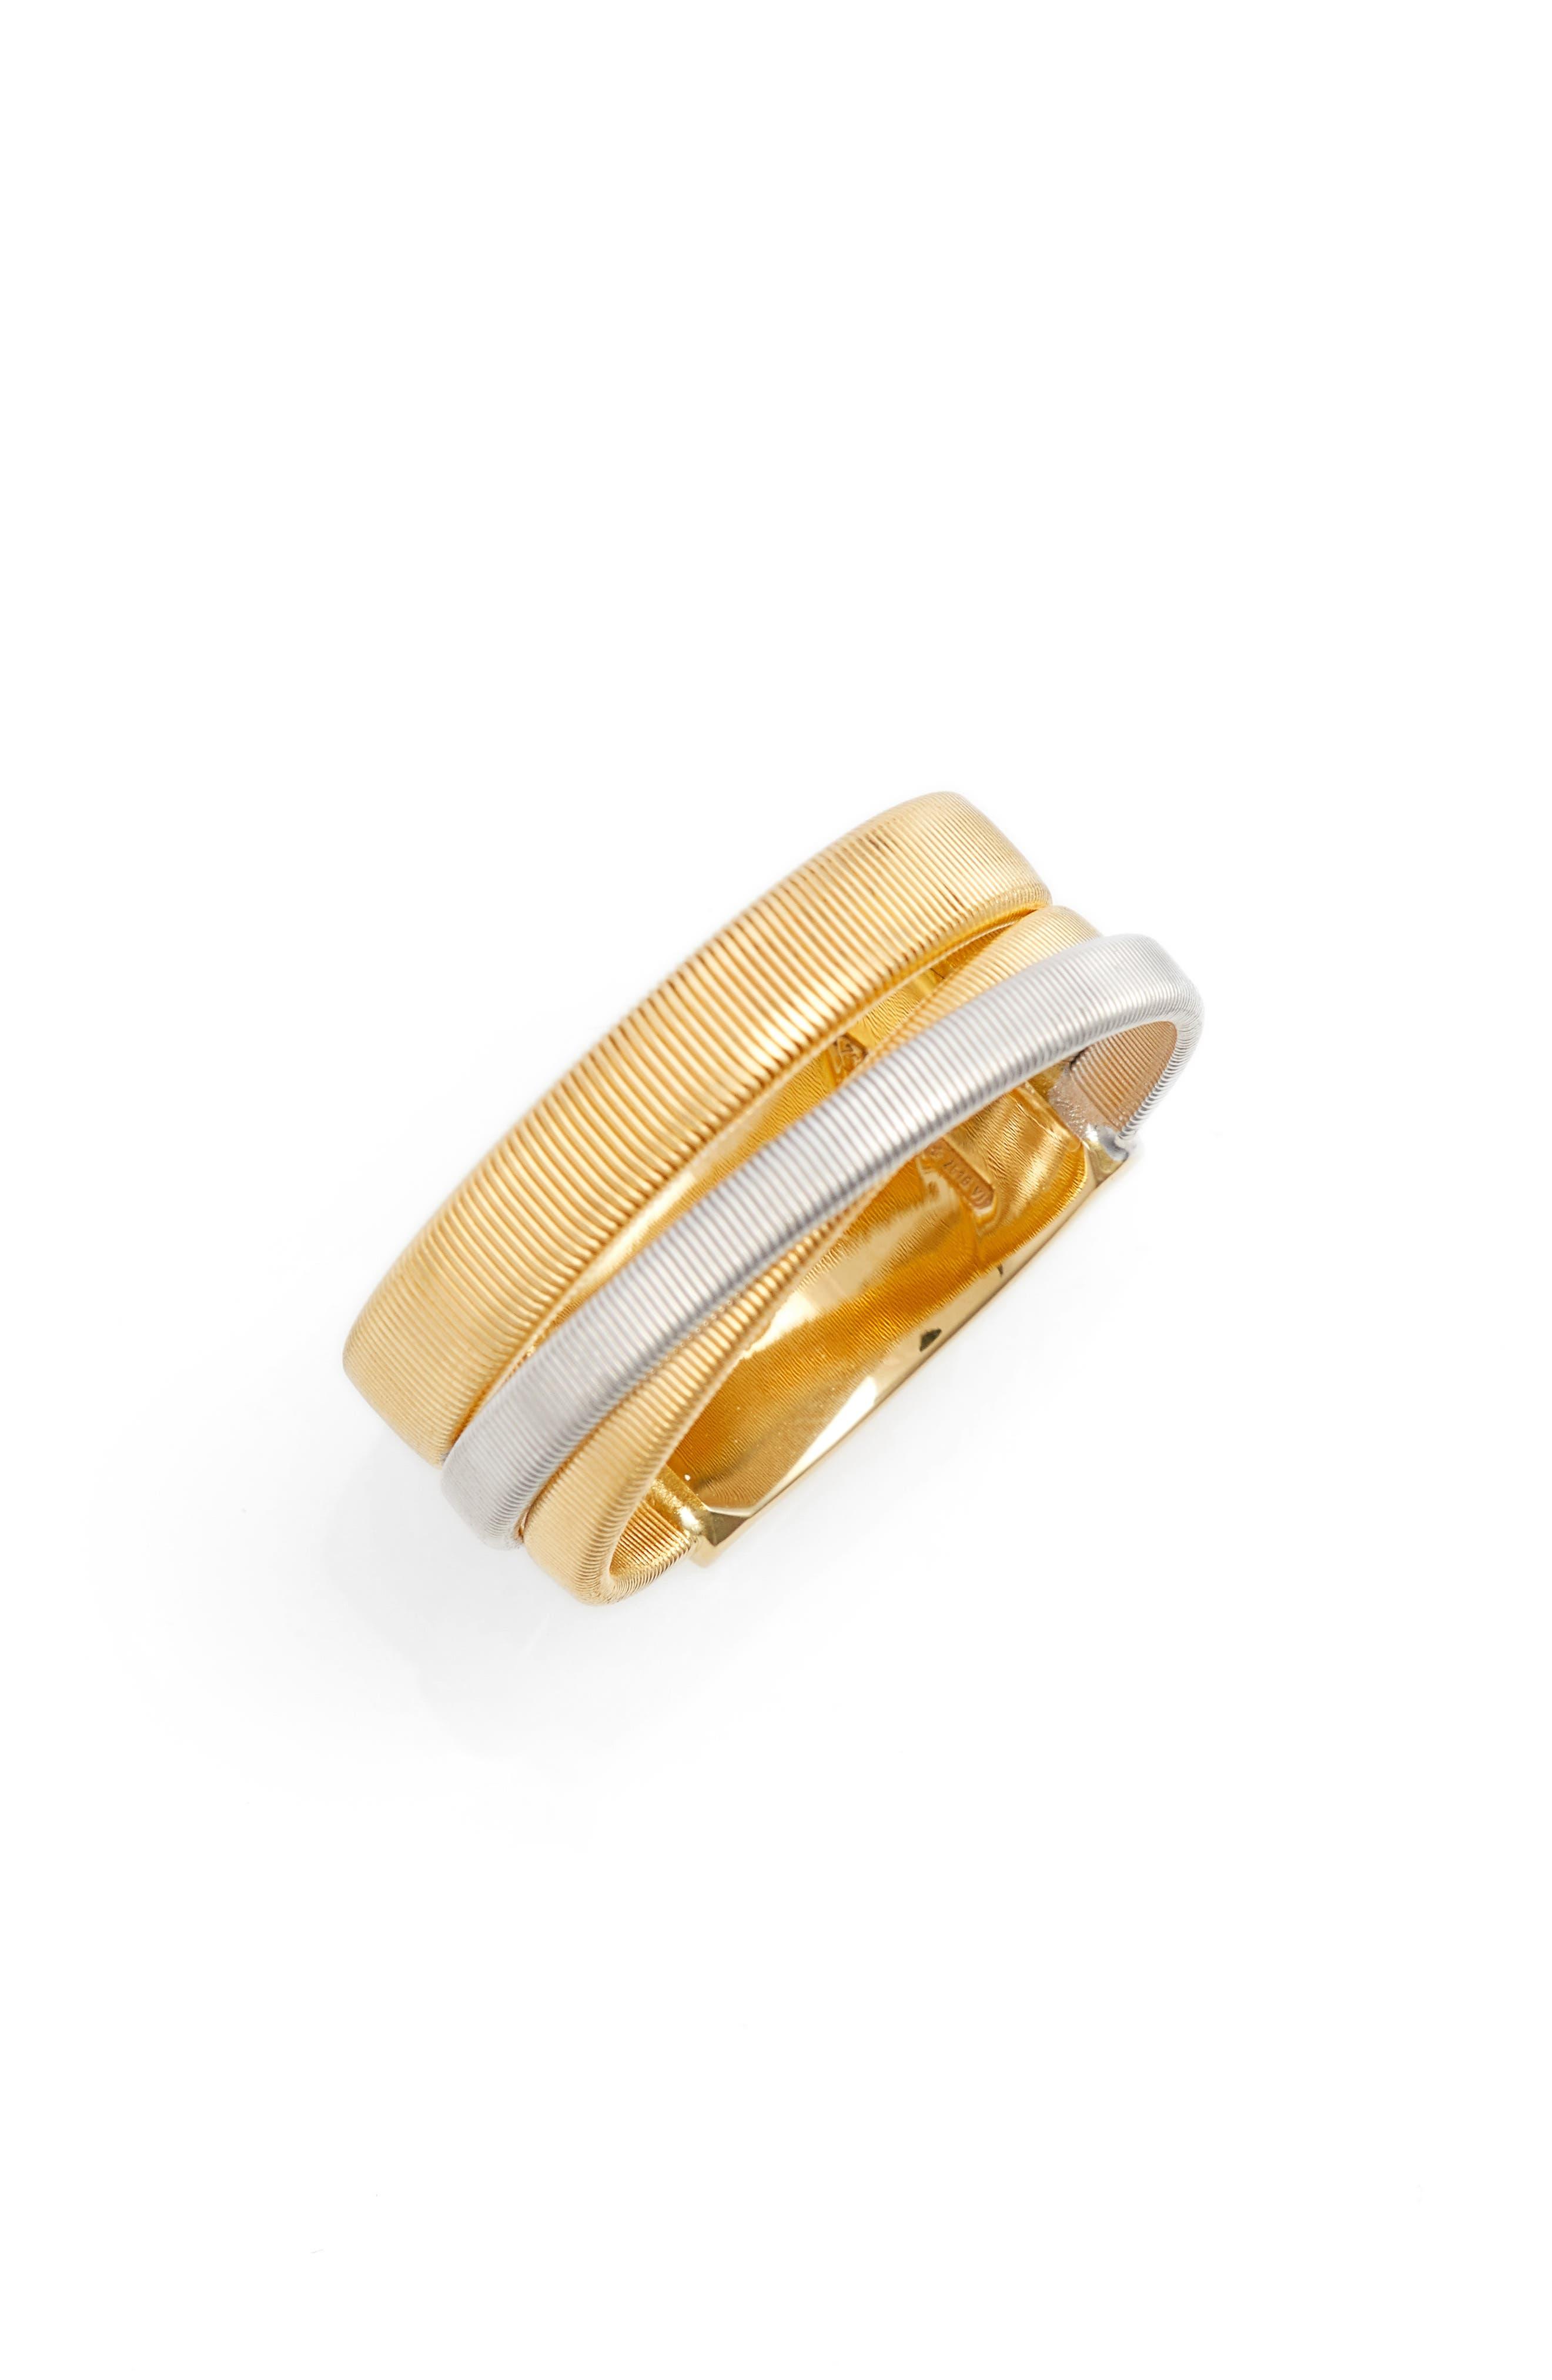 Masai Two-Tone Ring,                             Main thumbnail 1, color,                             YELLOW GOLD/ WHITE GOLD